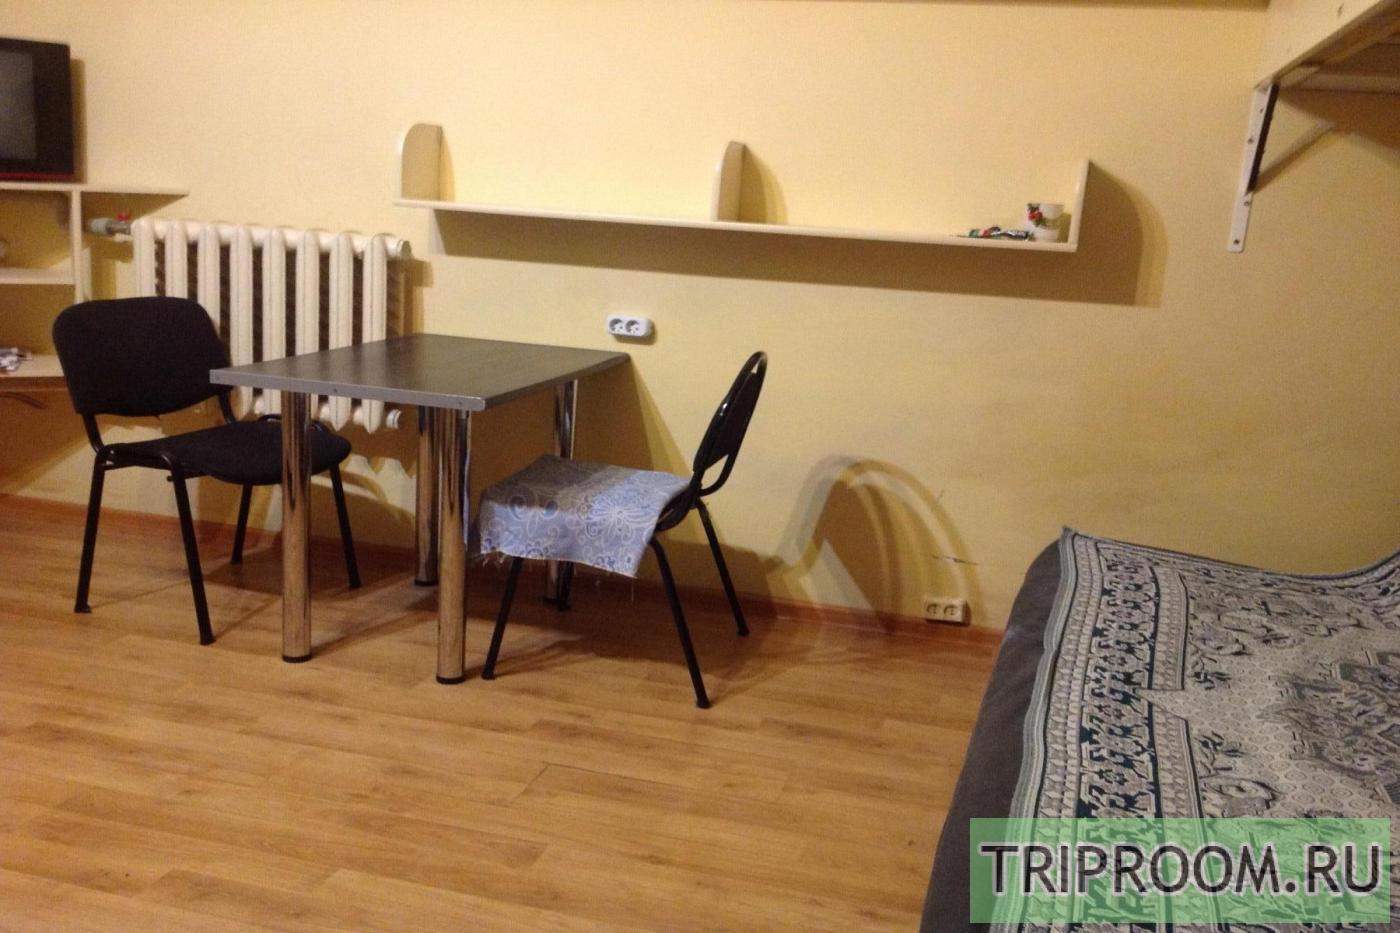 1-комнатная квартира посуточно (вариант № 1709), ул. Ломоносова улица, фото № 9